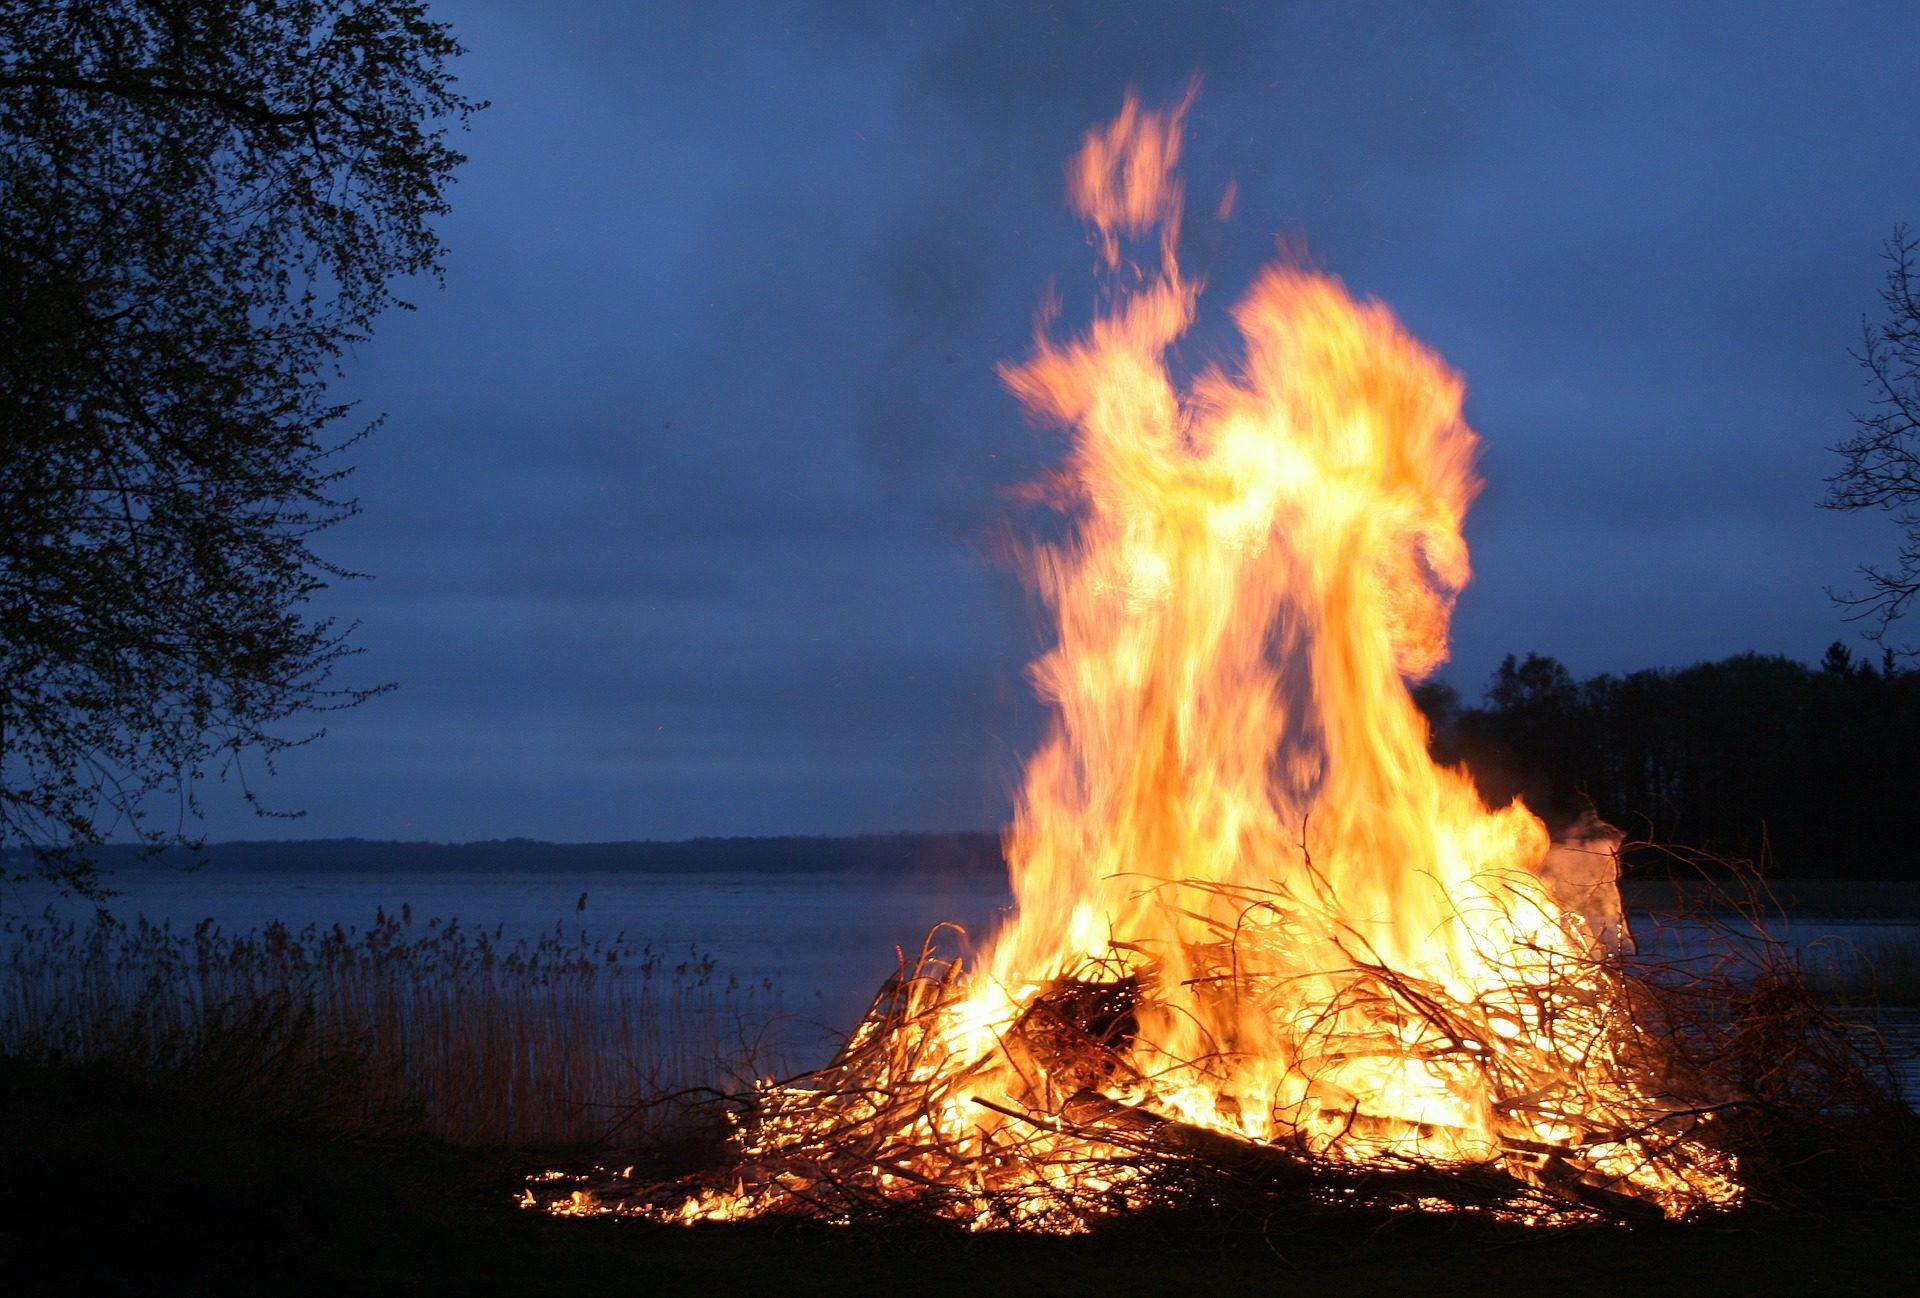 आग, अलाव, candela, रात, झील, गर्मी - HD वॉलपेपर - प्रोफेसर-falken.com